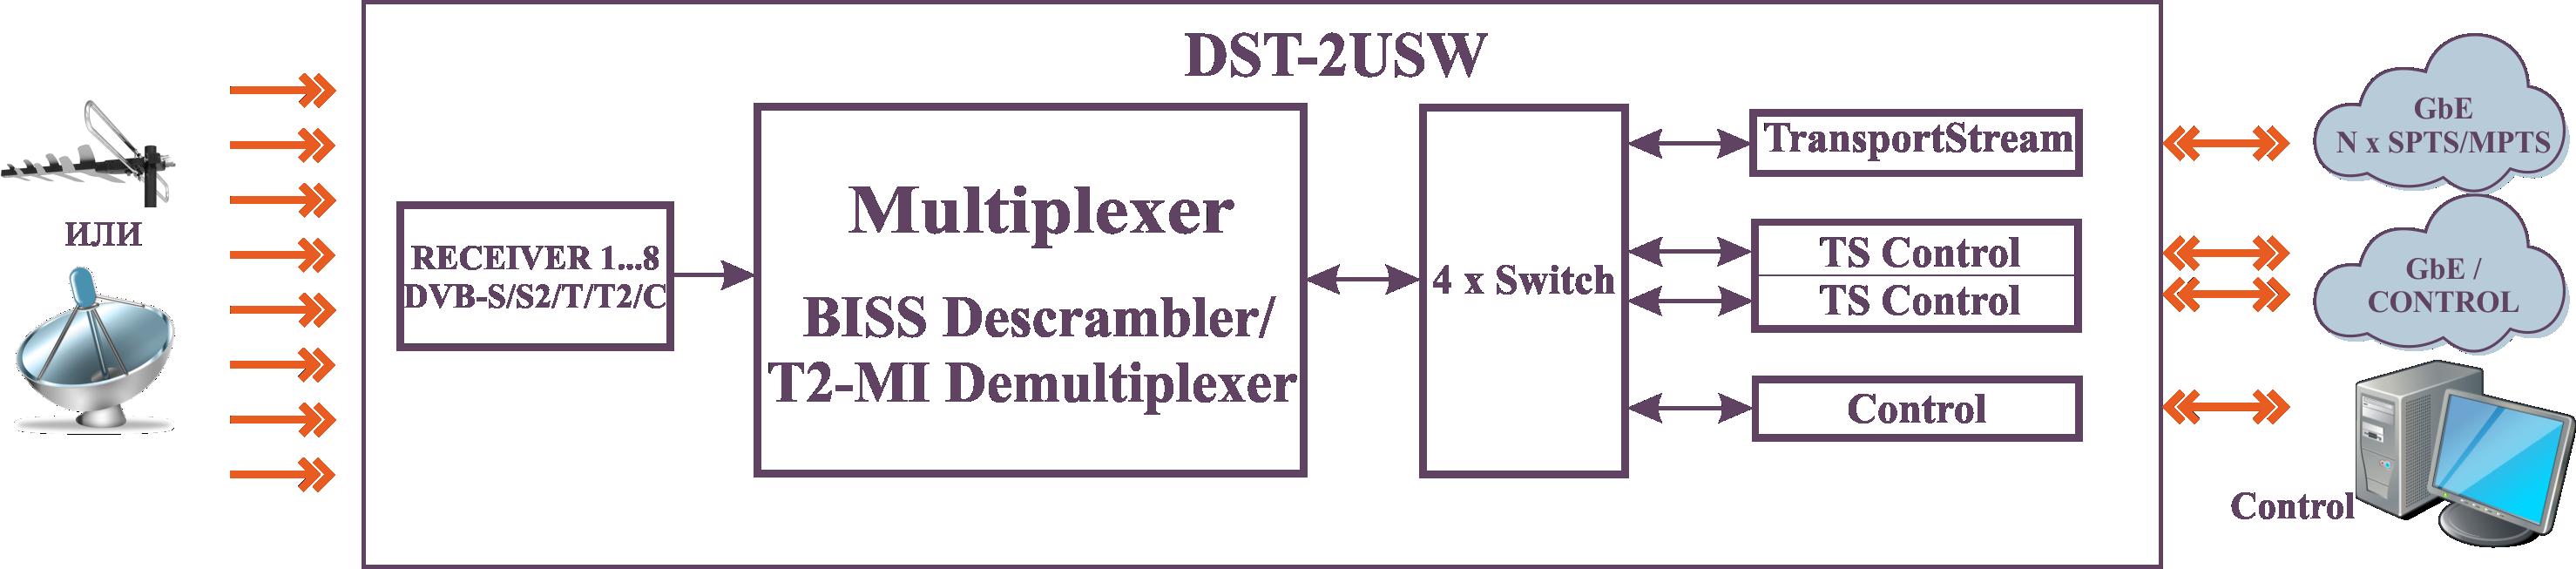 Схема DST-2U приемника с 8x DVB-S2/S/T2/T/C тюнерами и T2-MI